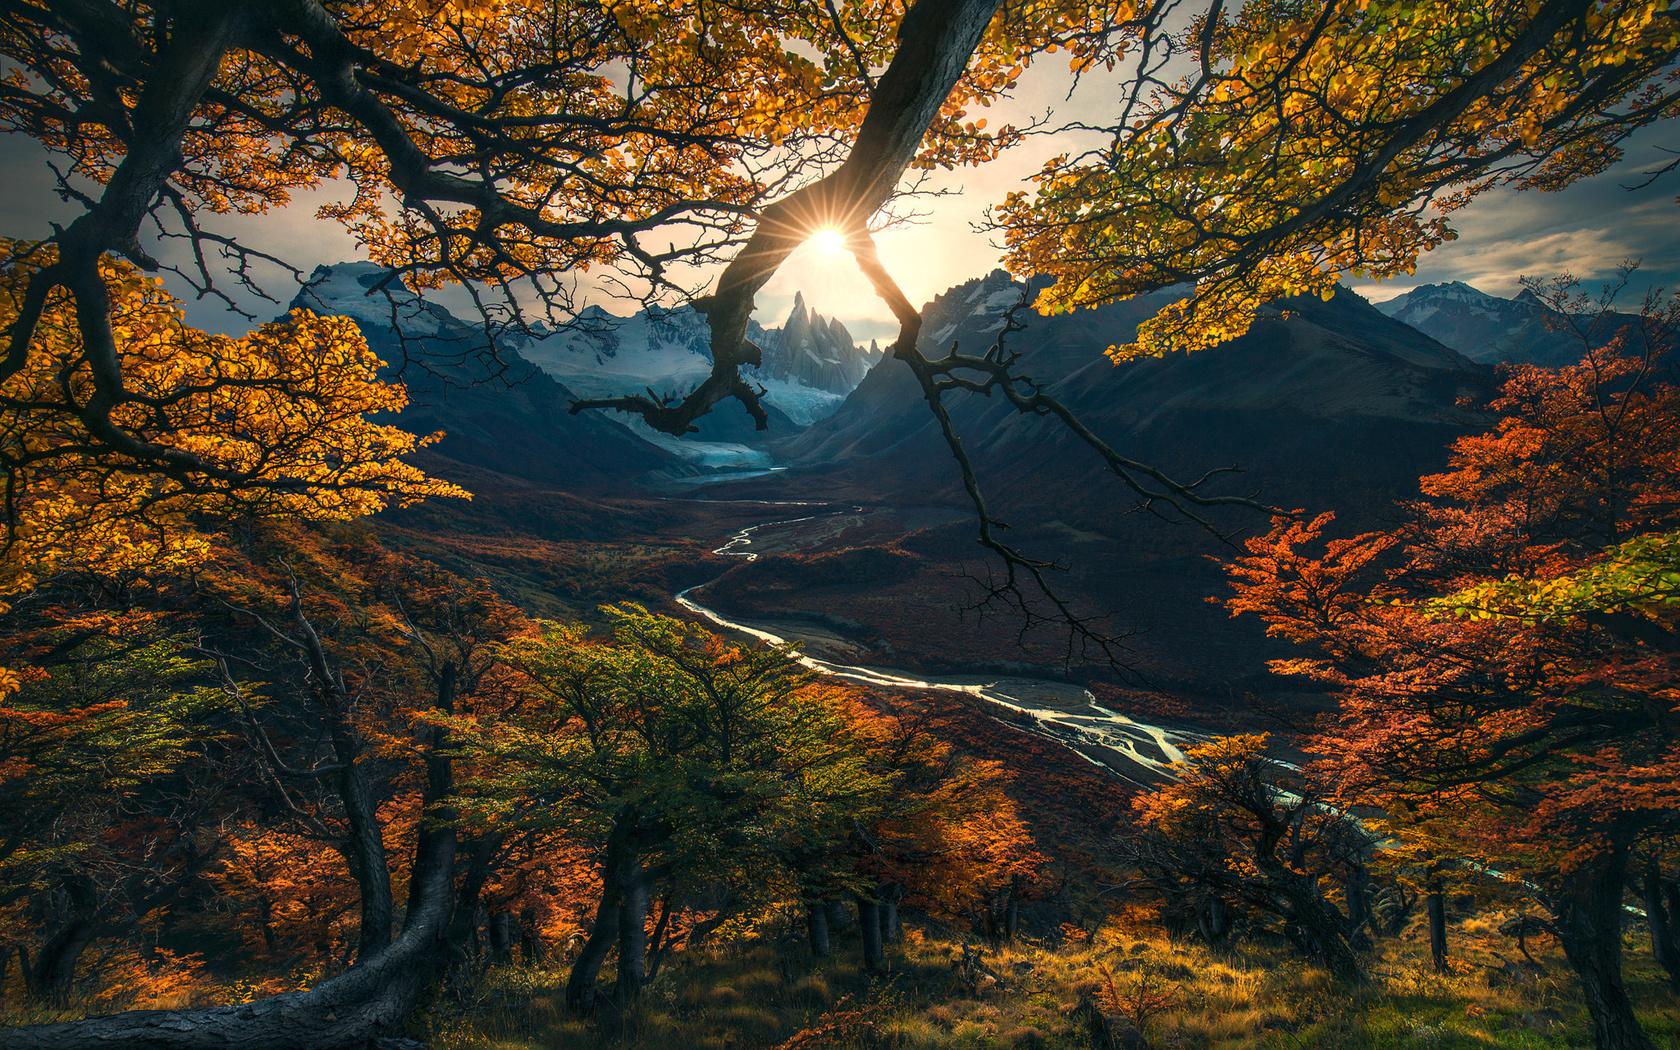 природа, осень, фото, max rive, аргентина, патагония, горы, долина, закат